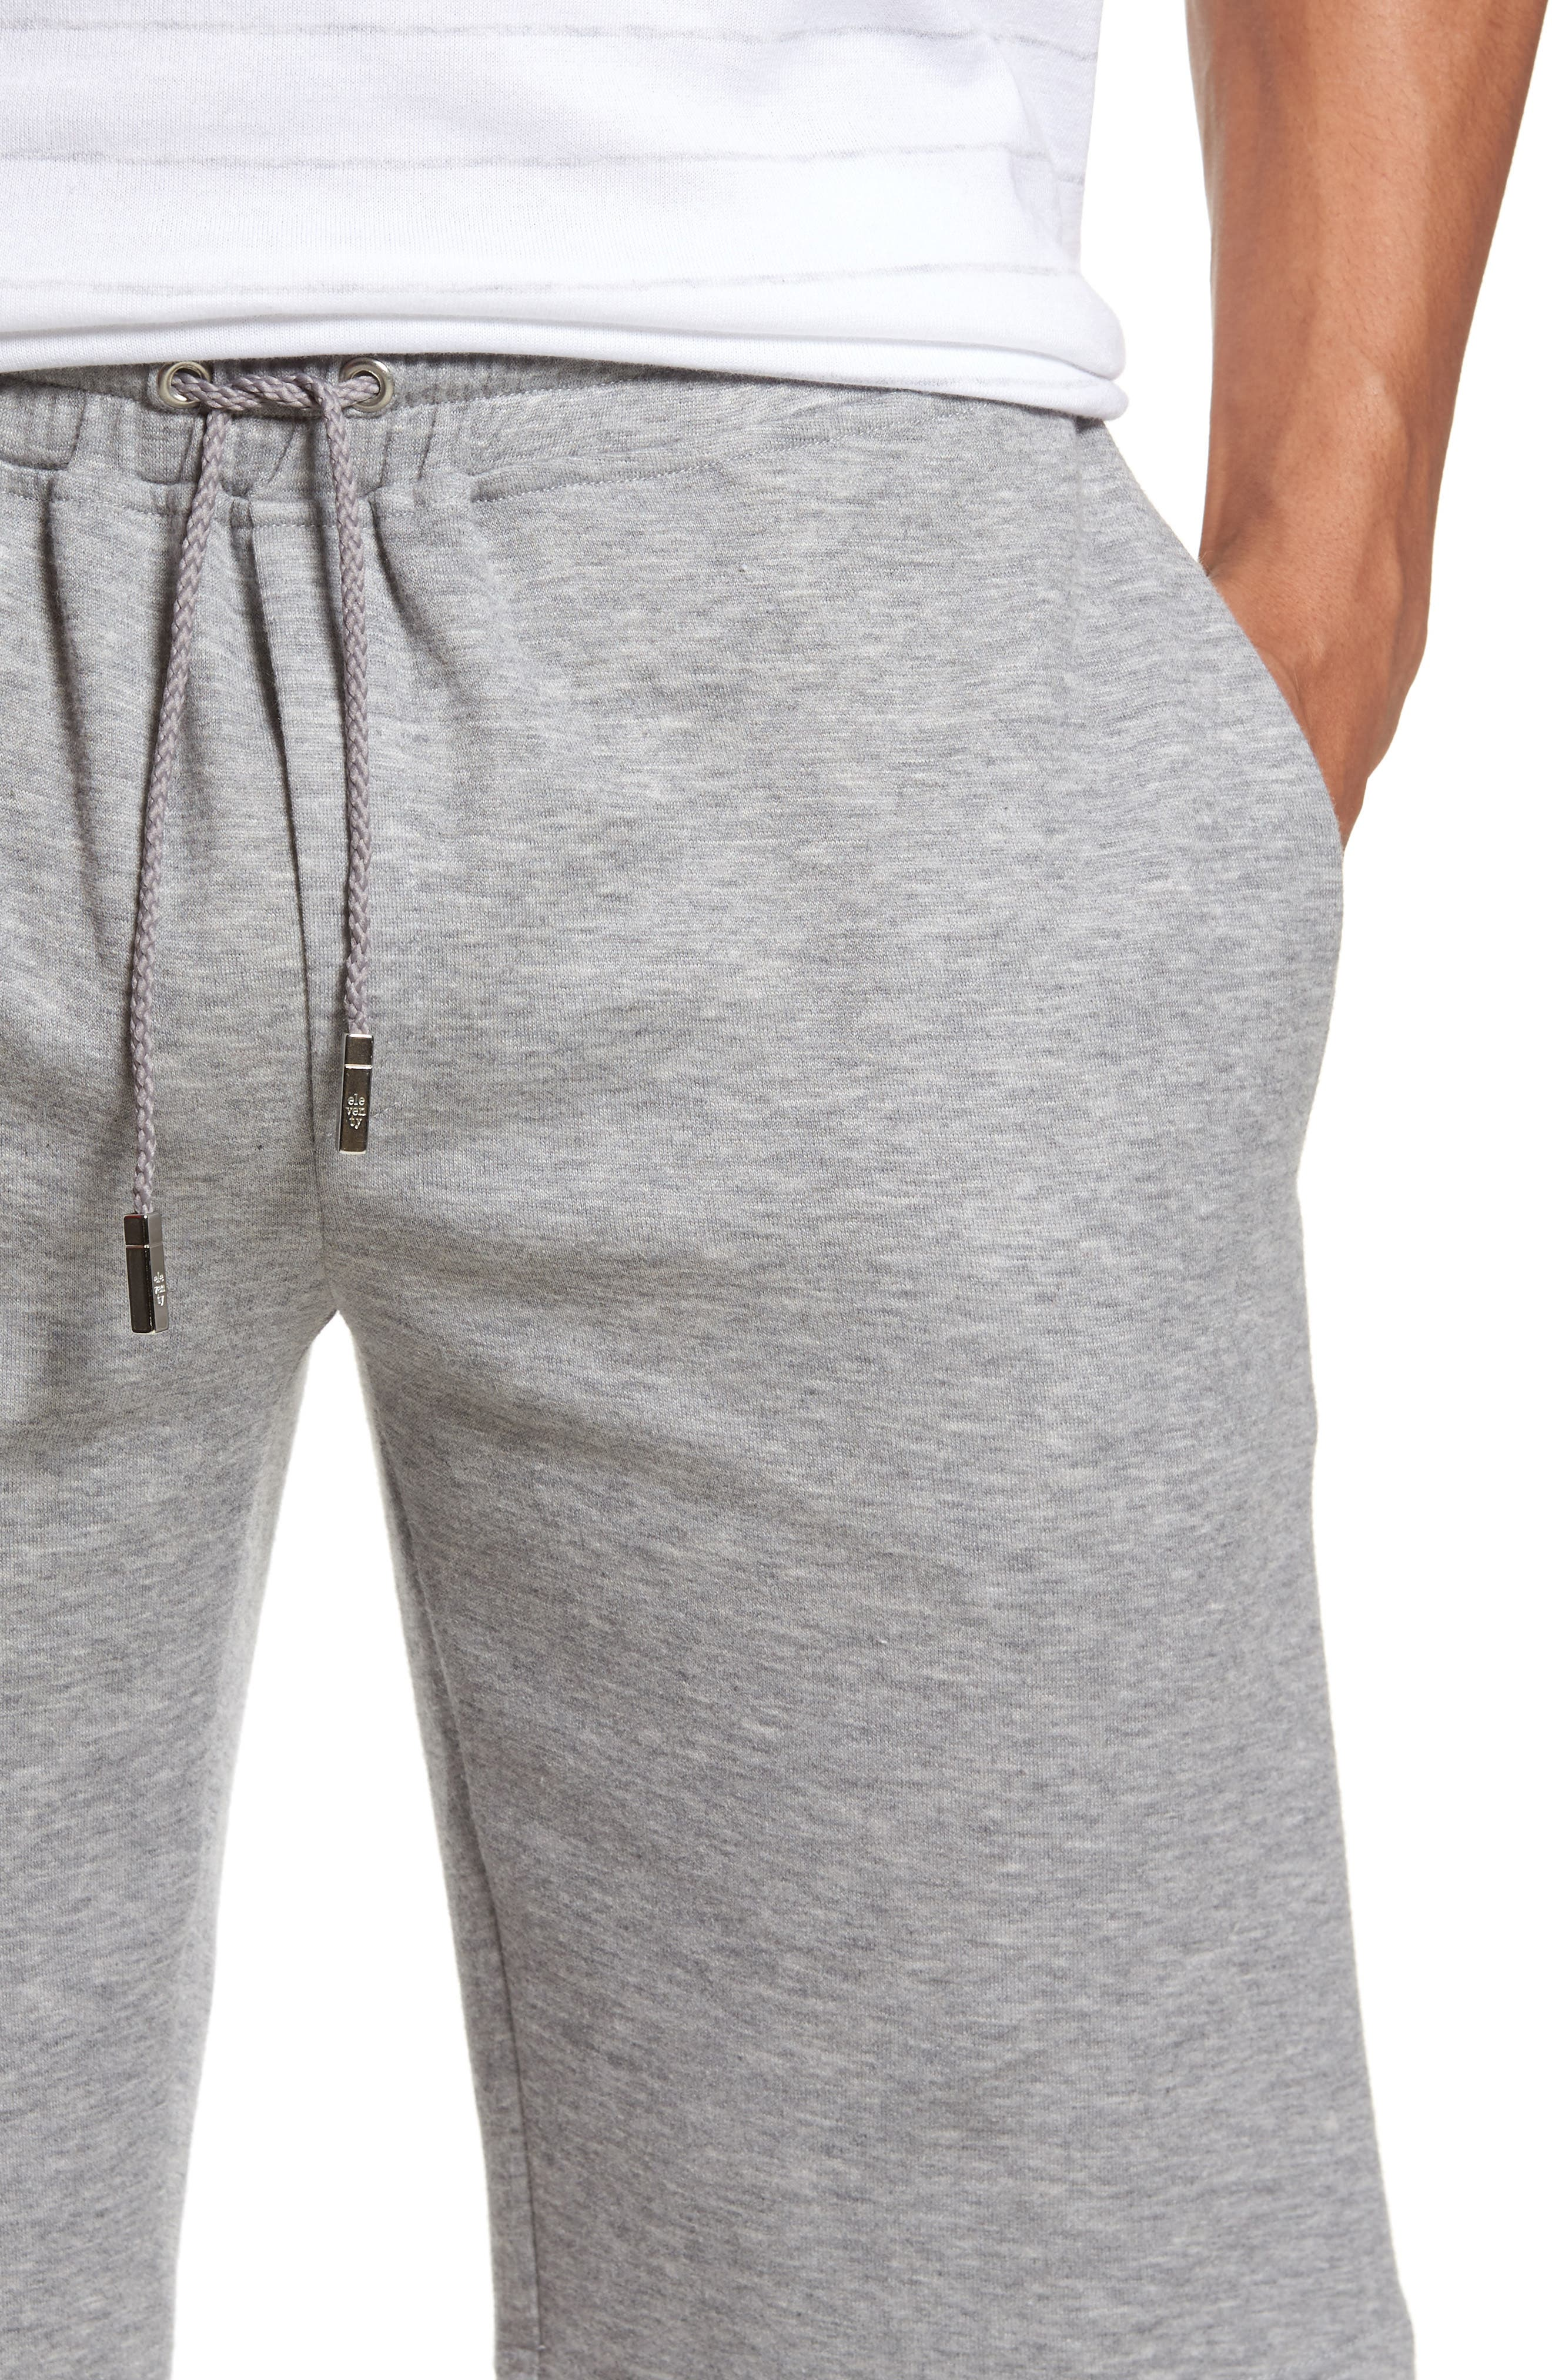 Drawstring Knit Shorts,                             Alternate thumbnail 4, color,                             Light Grey